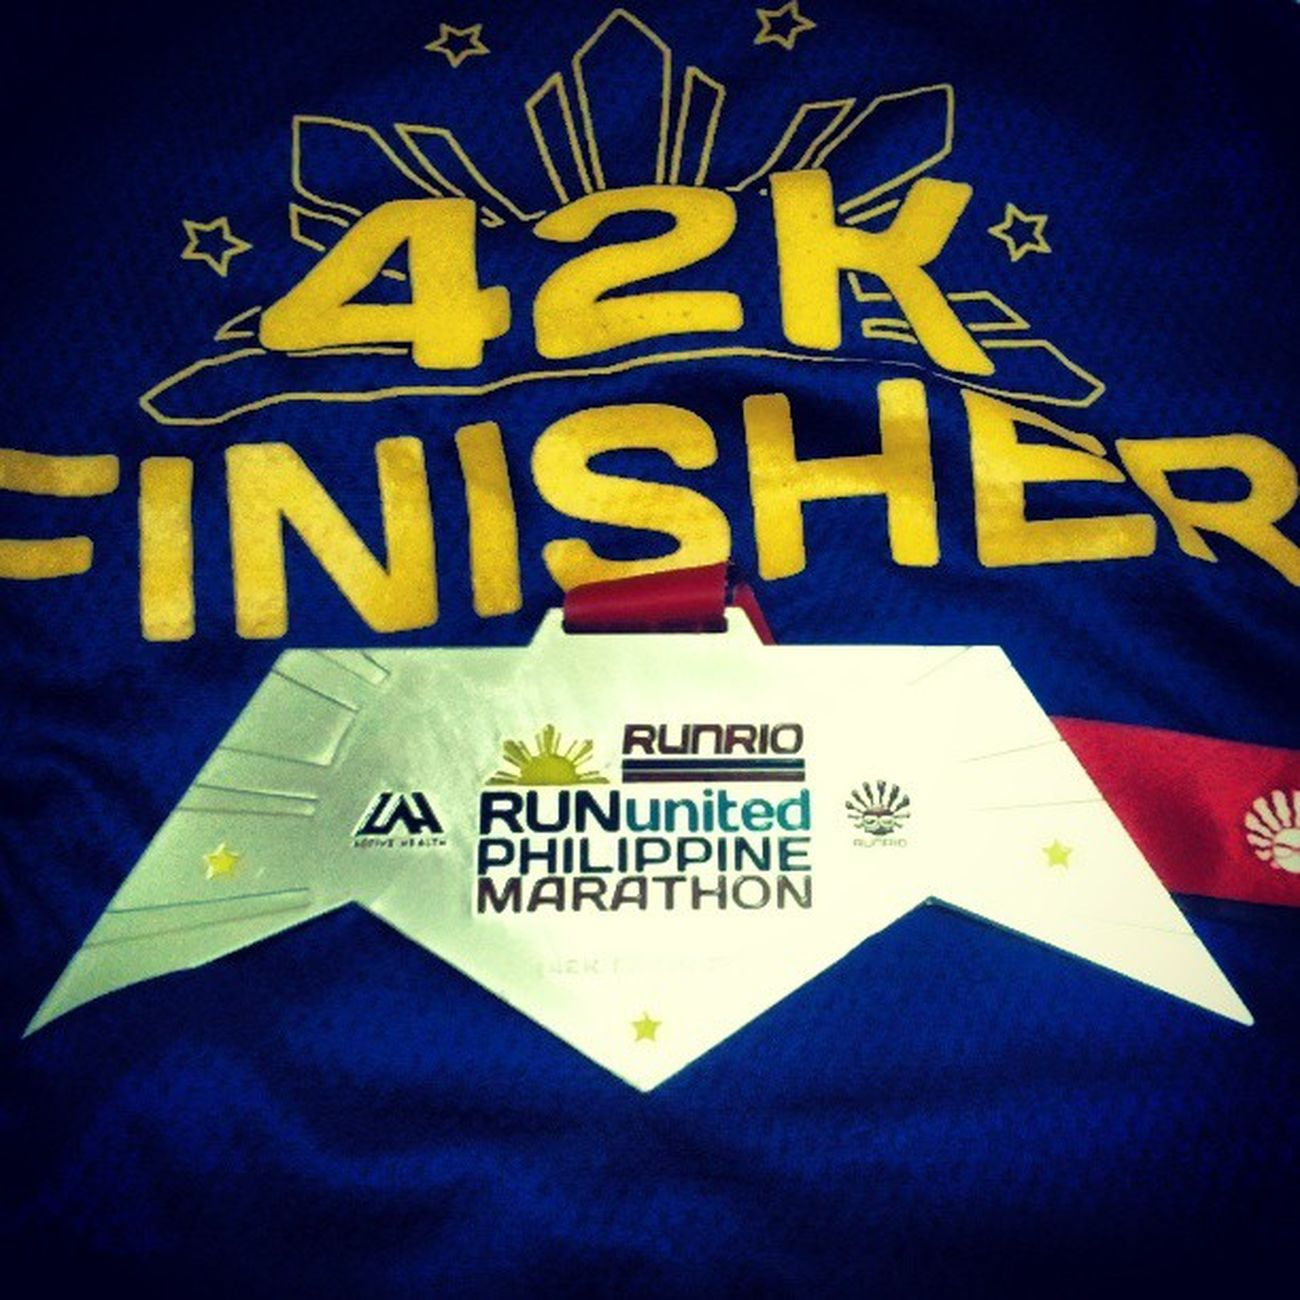 Finished my 2nd marathon RUPM Runrio 42km